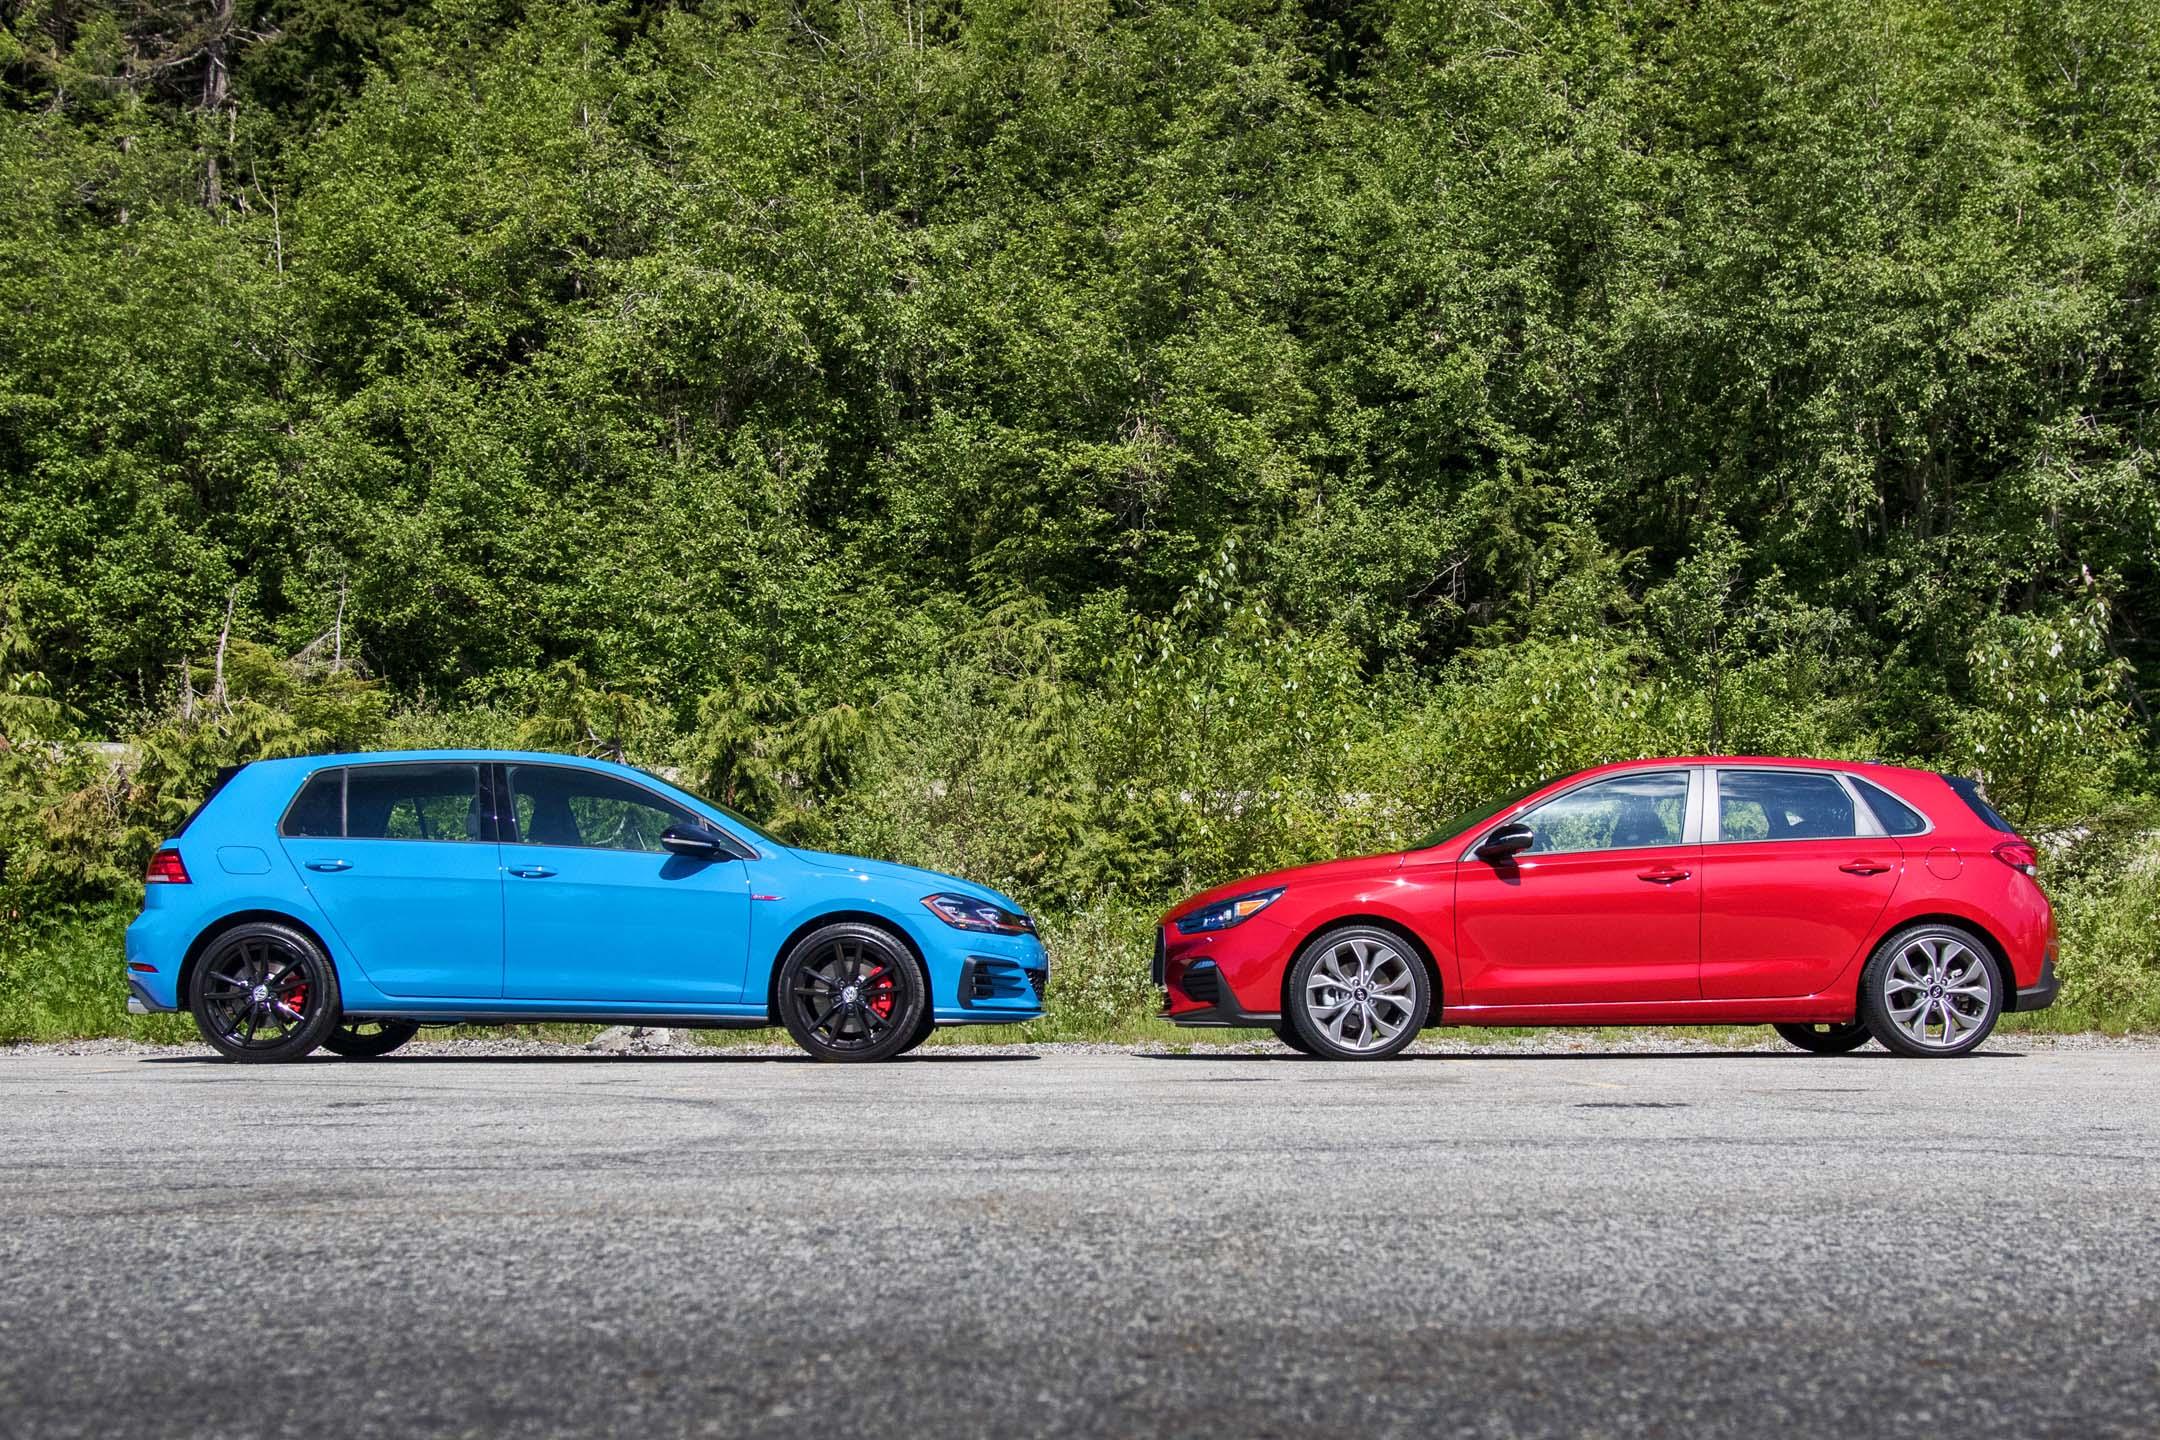 2019 Hyundai Elantra Gt N Line Vs 2019 Volkswagen Golf Gti Rabbit Head To Head Comparison Review